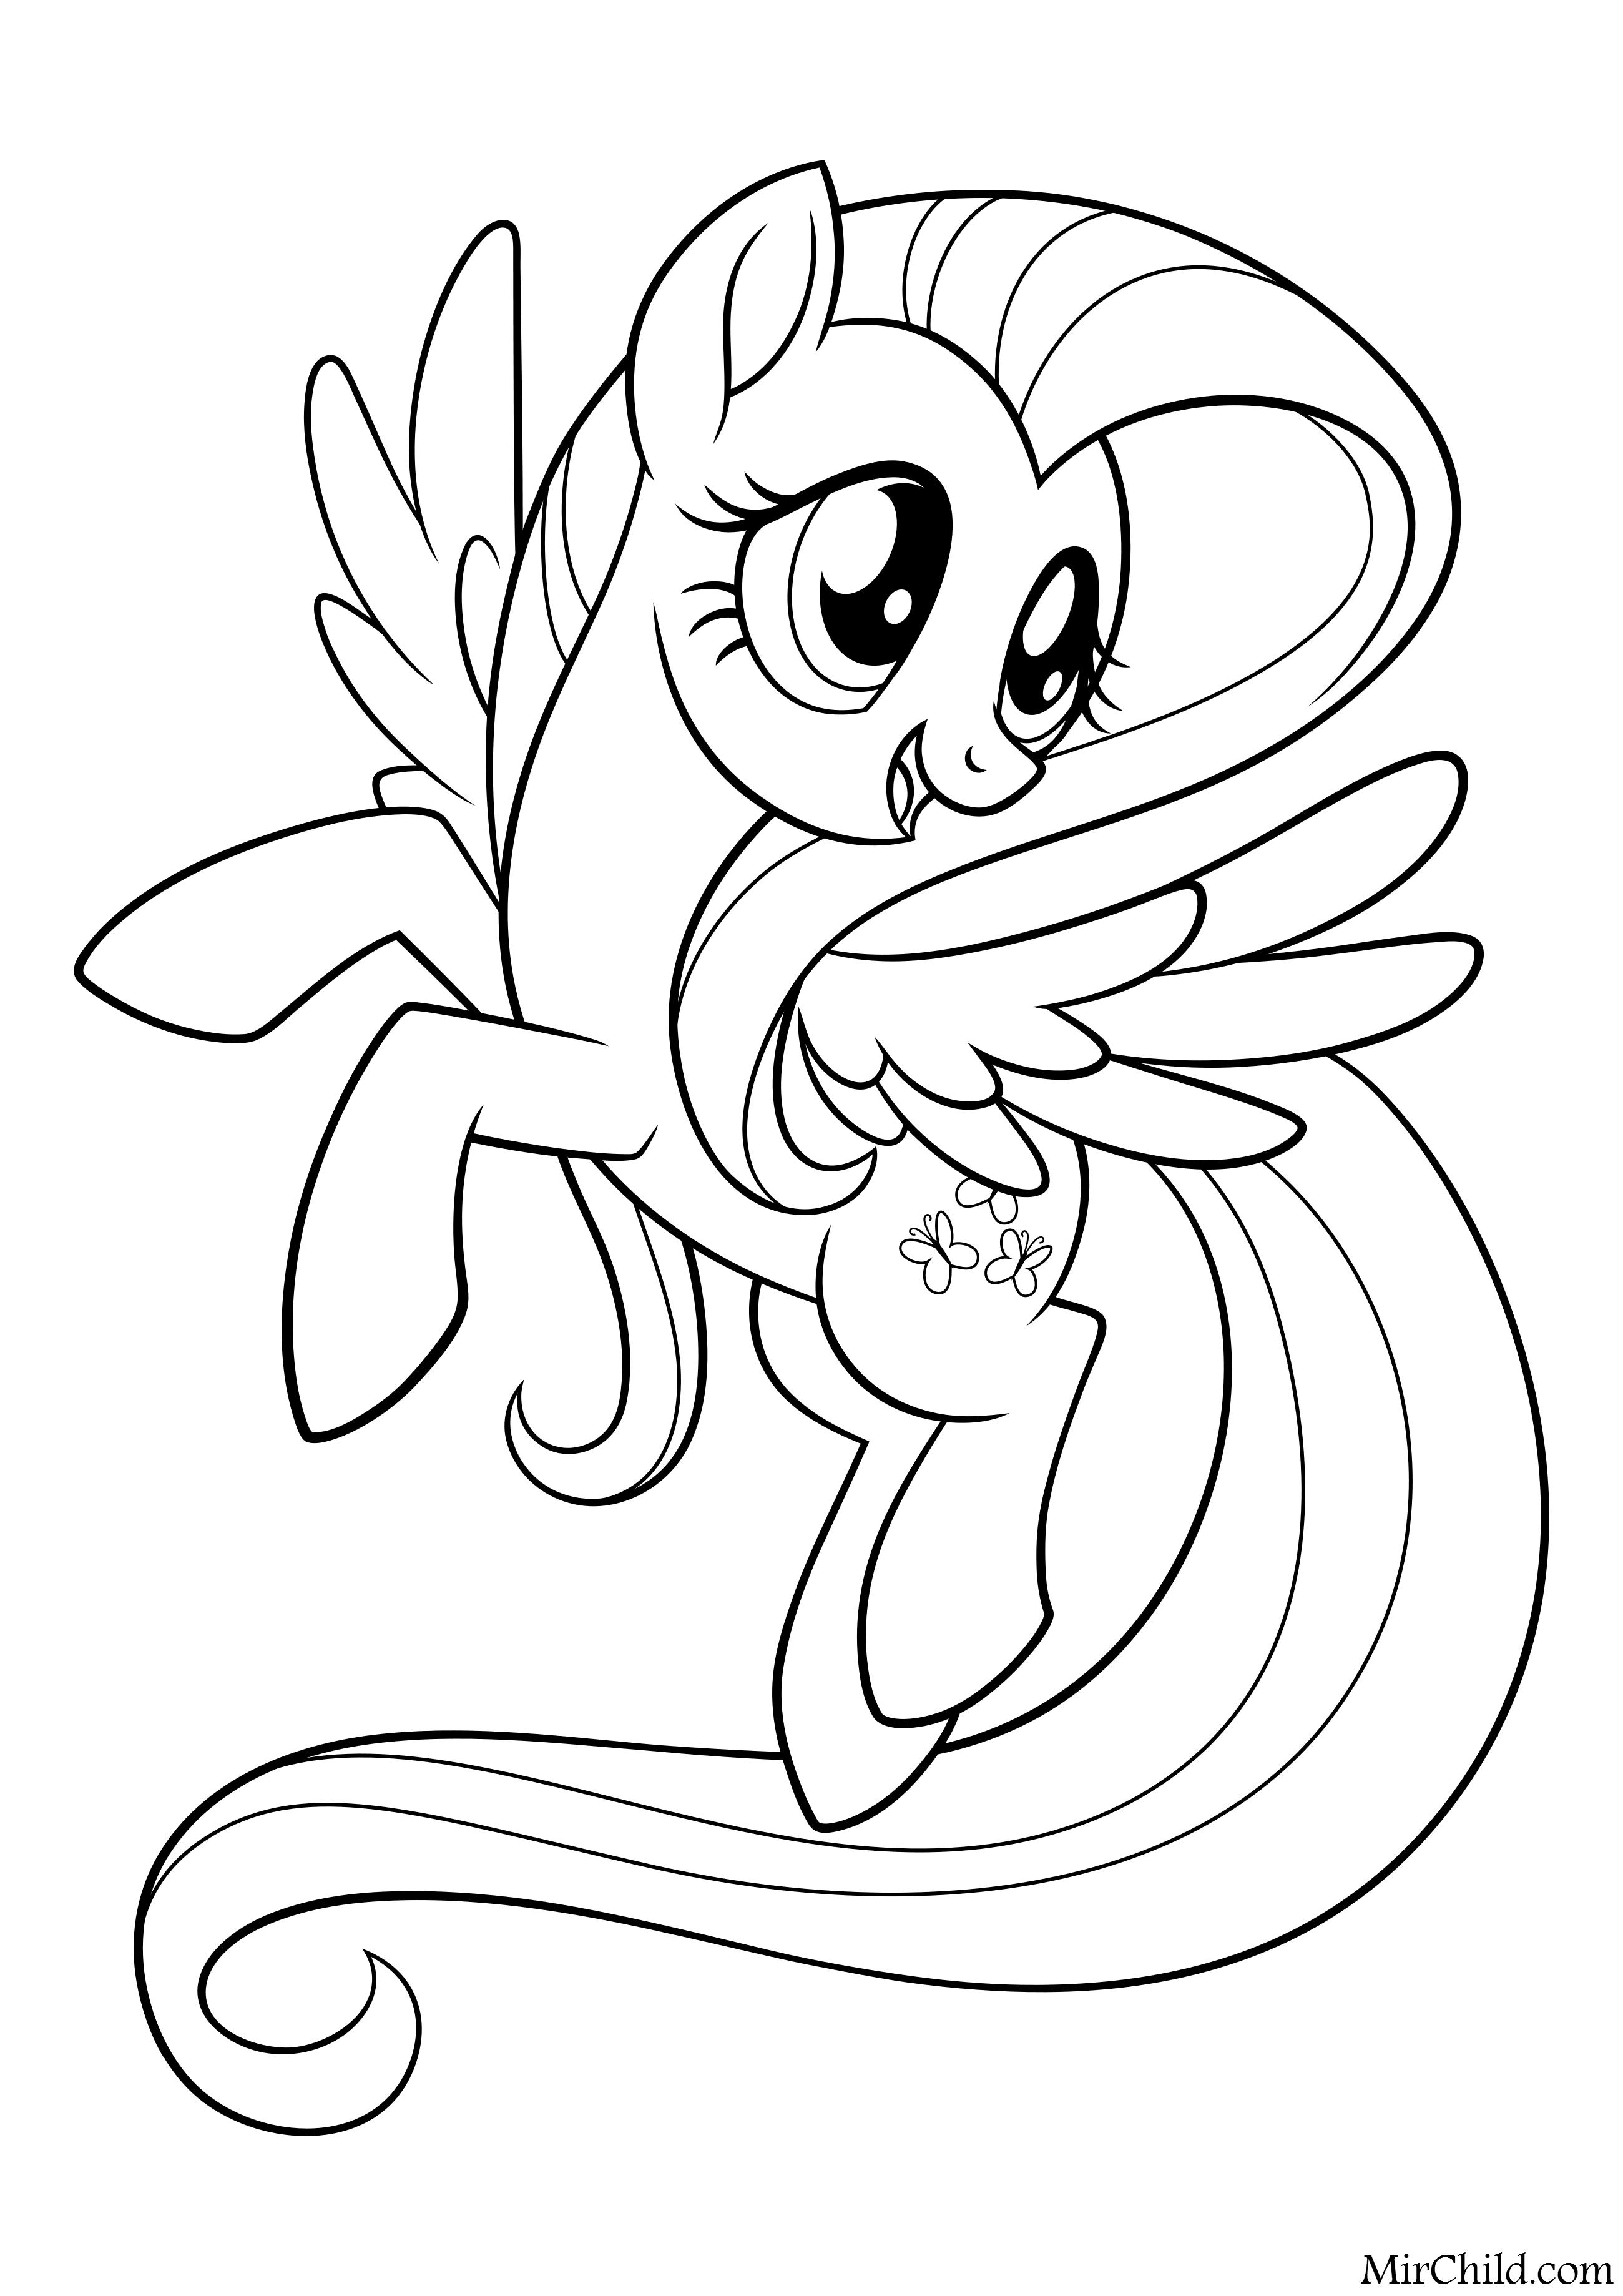 Раскраска - My Little Pony в кино - Флаттершай | MirChild